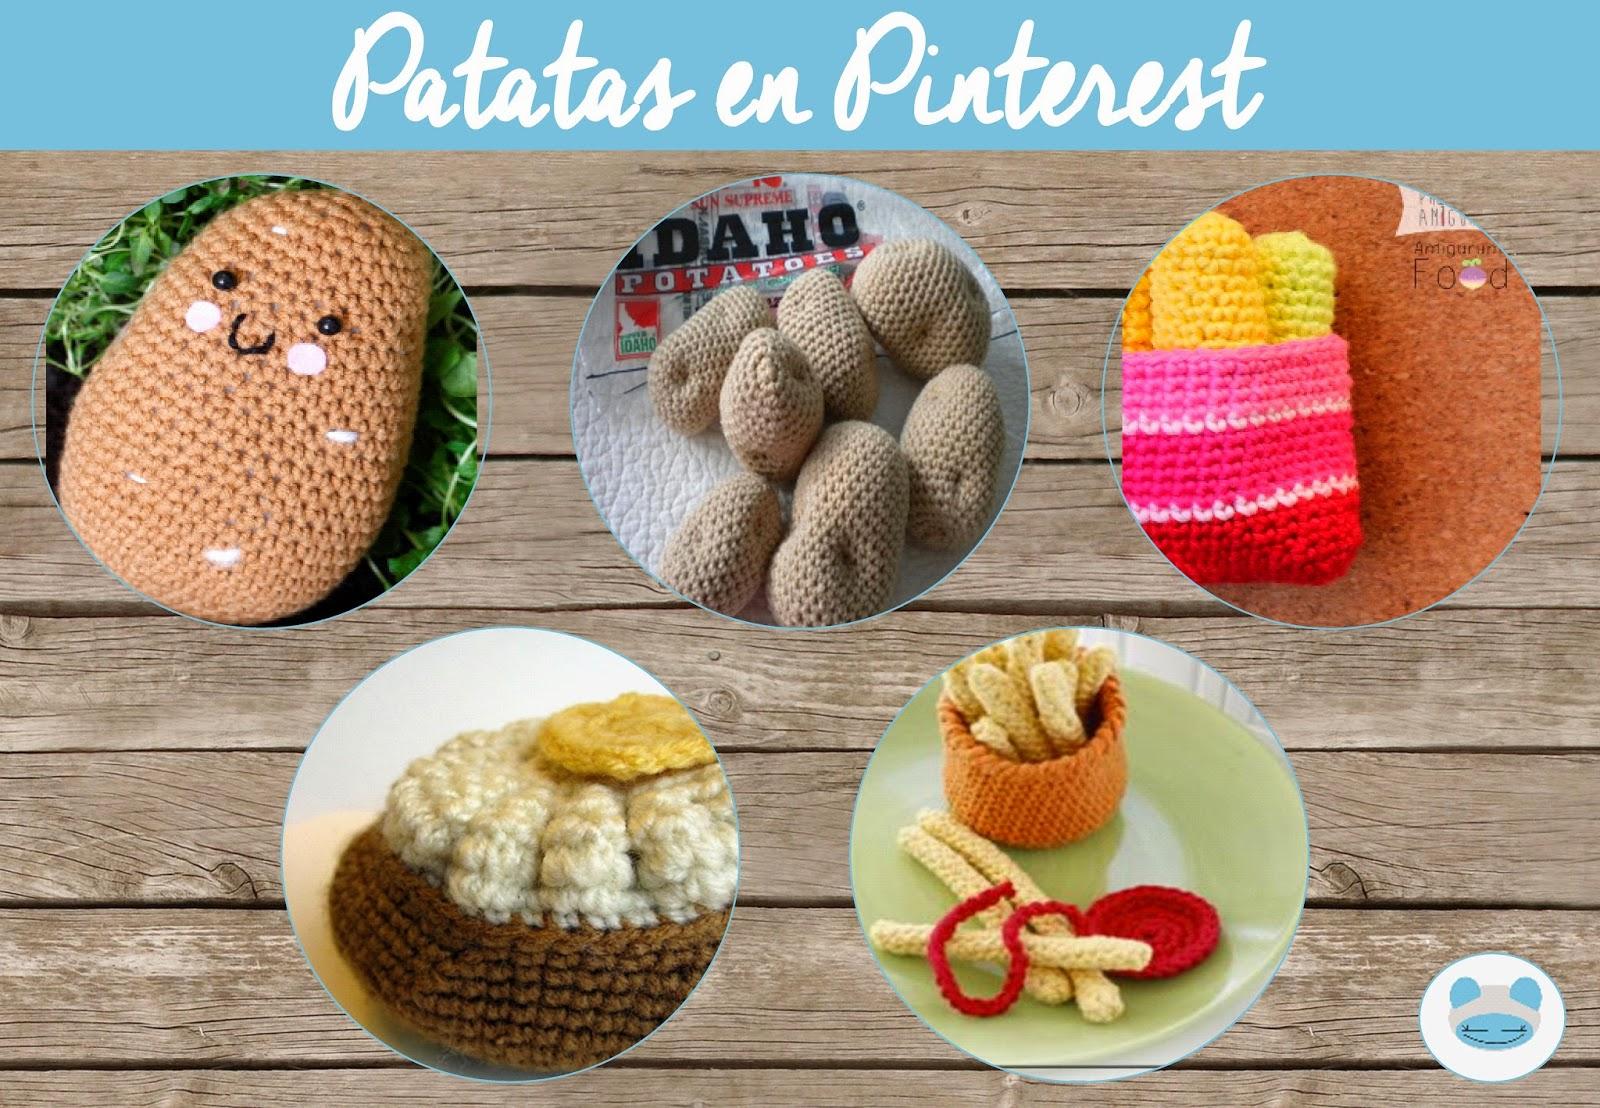 https://es.pinterest.com/scacahueta/reto-comidita-amigurumi-iii-la-patata/